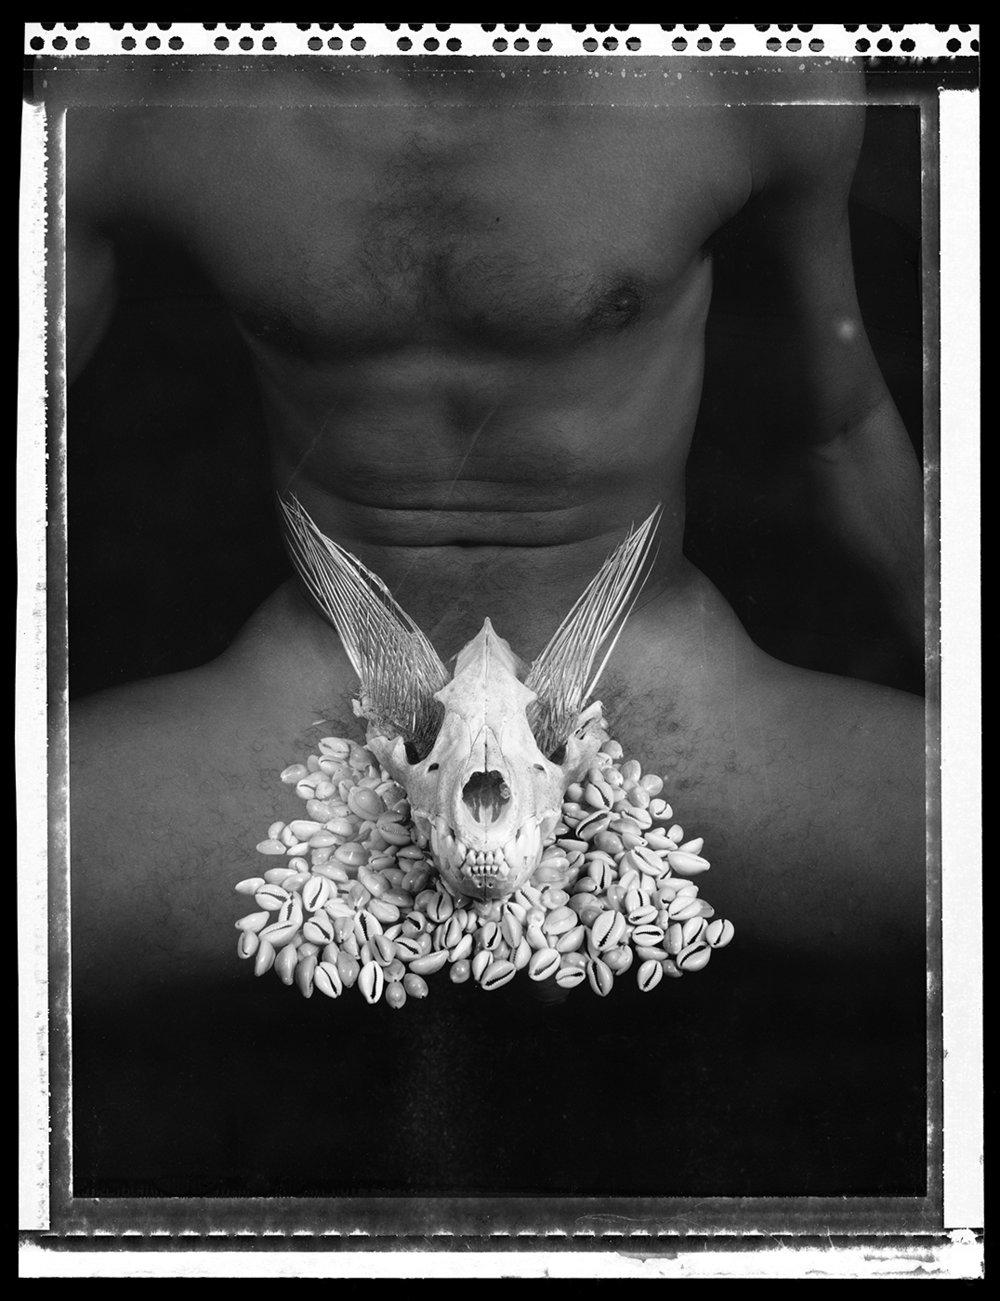 Winged Desire, 1994